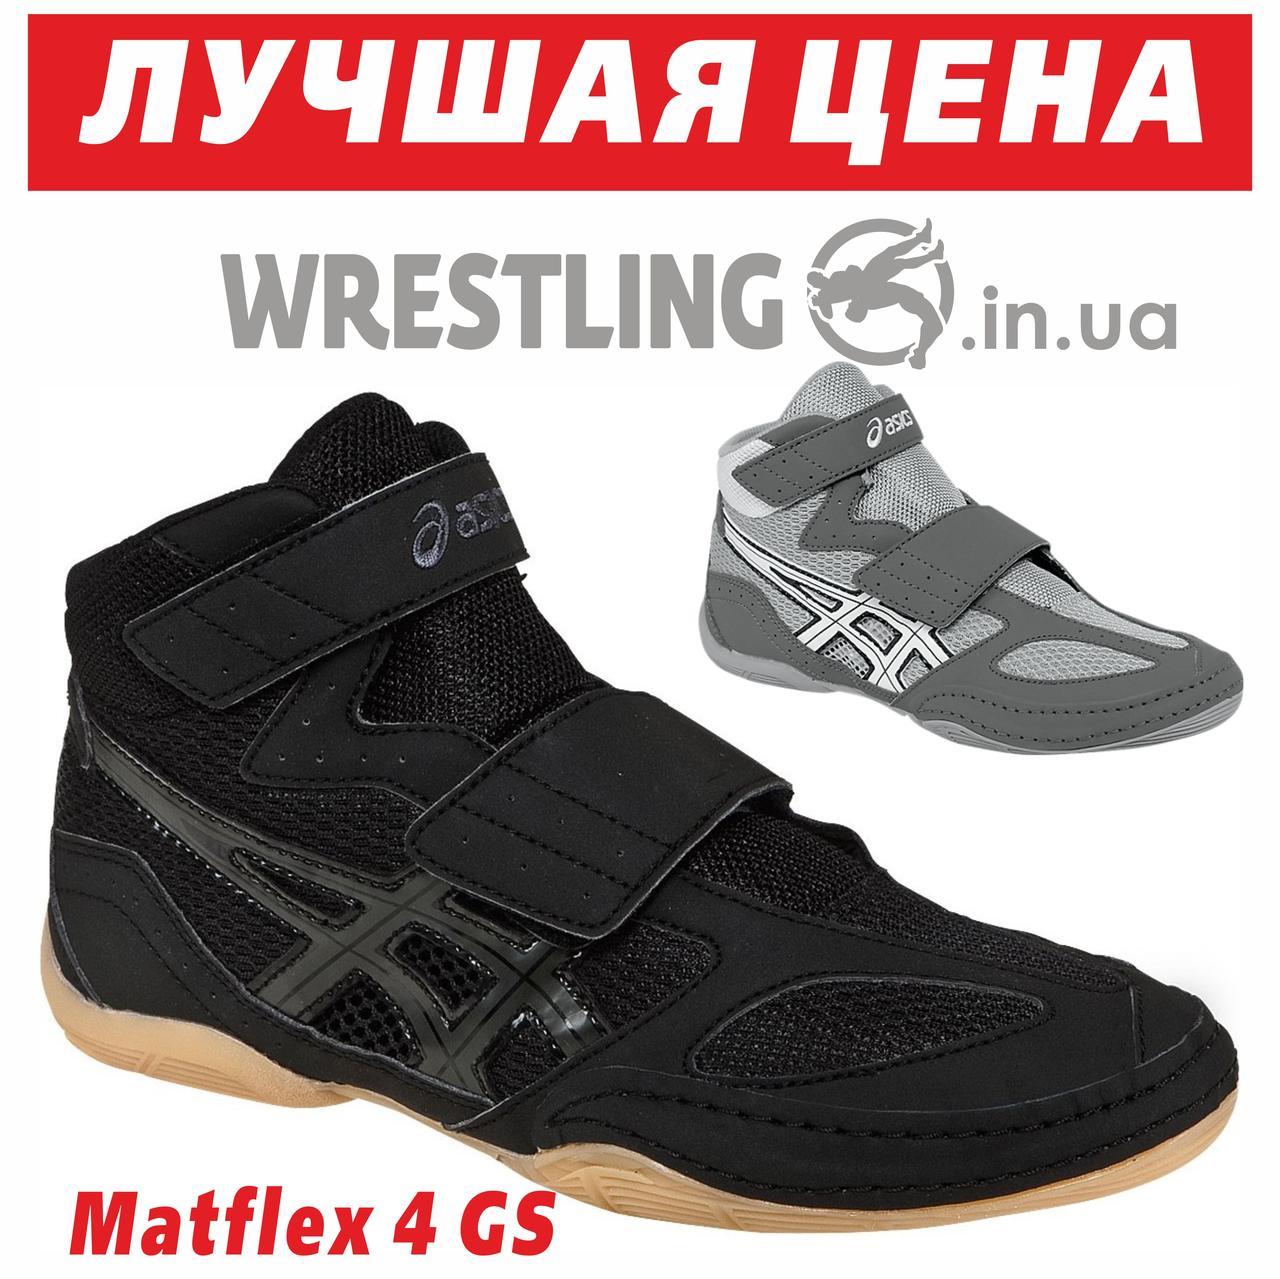 fbfa1136ffde Детские Борцовки боксерки Asics Matflex 4 GS Wrestling   Boxing ...